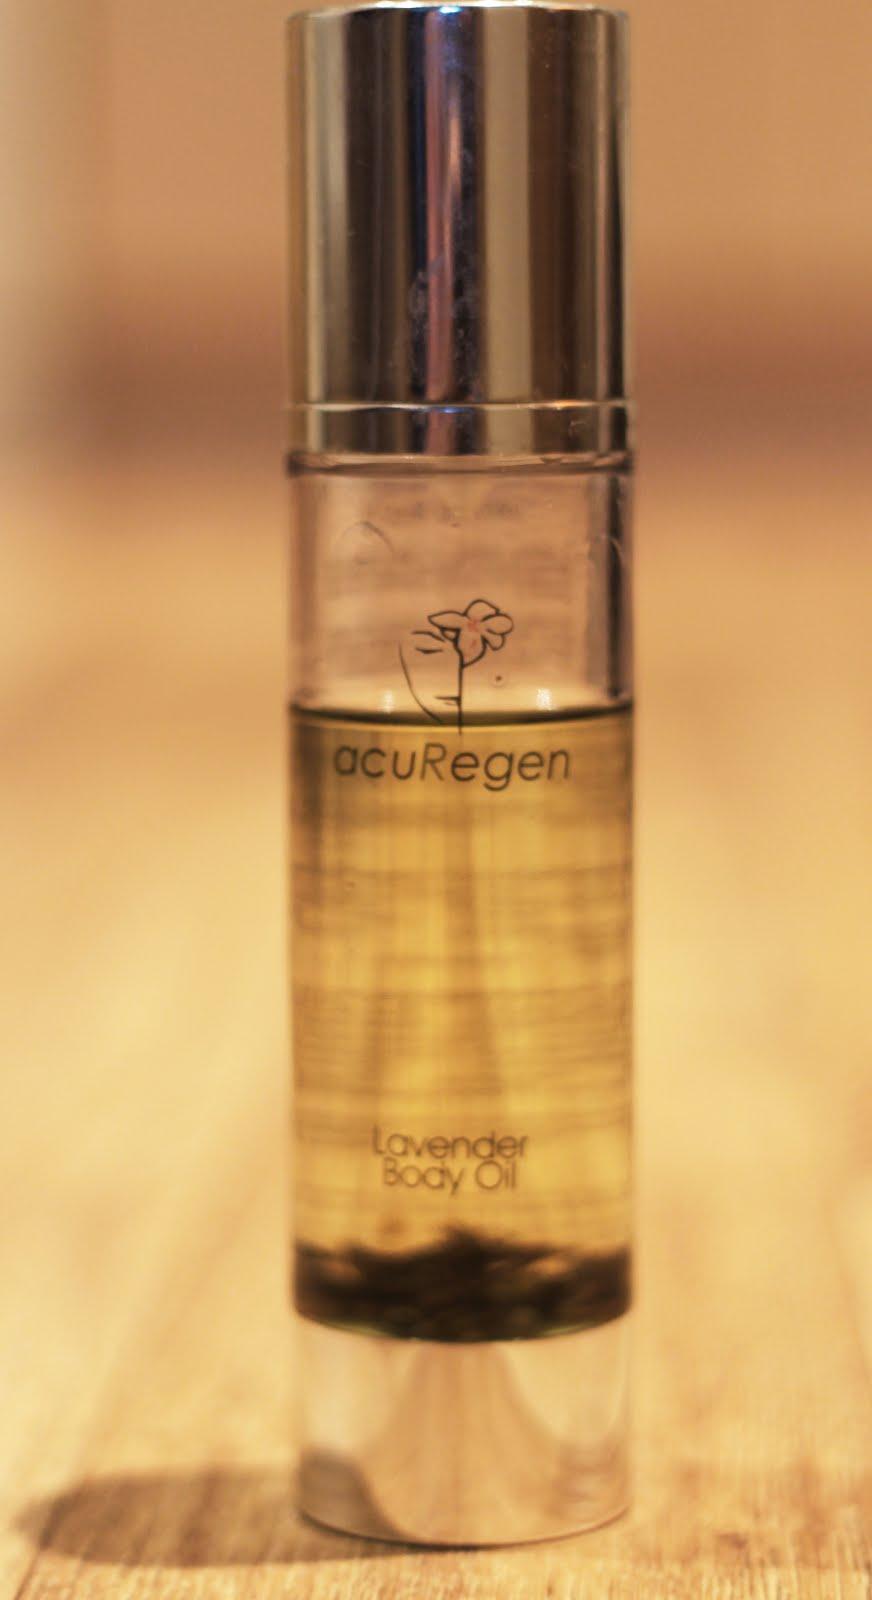 Smooth skin for winter - acuregen body oils